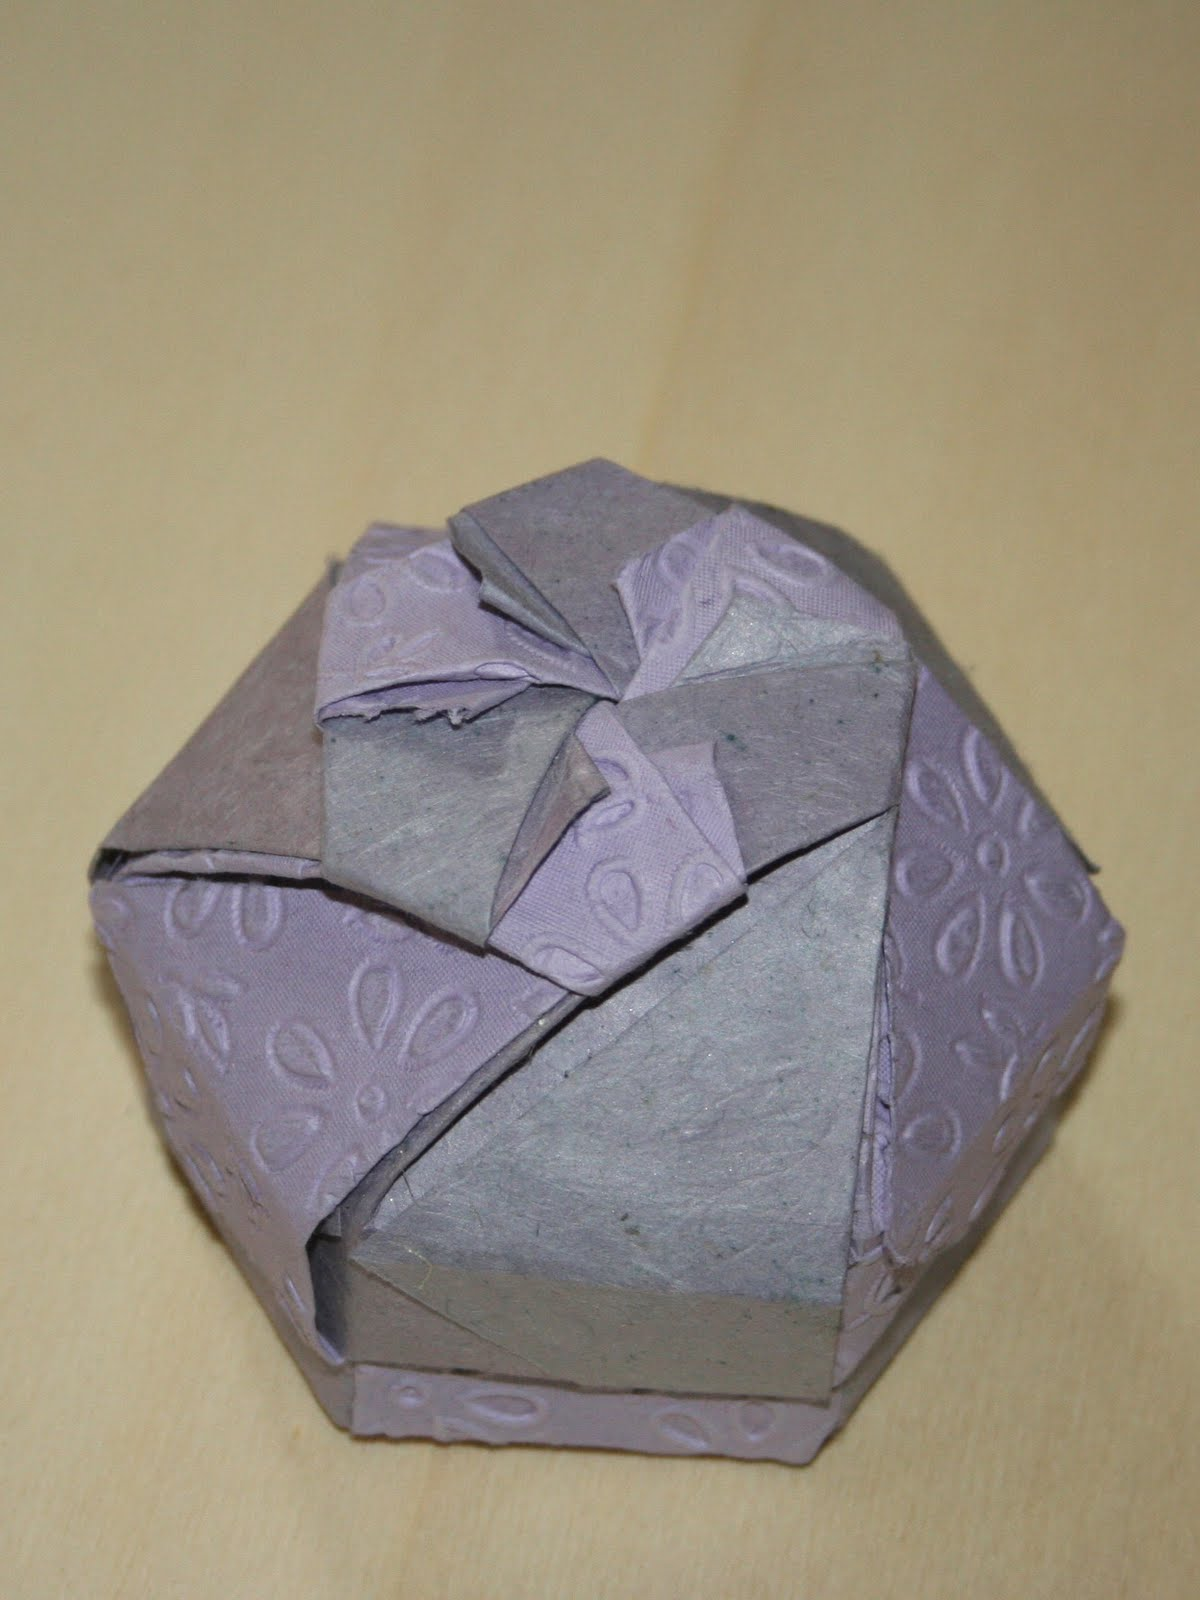 folding origami box diagram 2001 mitsubishi mirage radio wiring constructions heptagonal 43